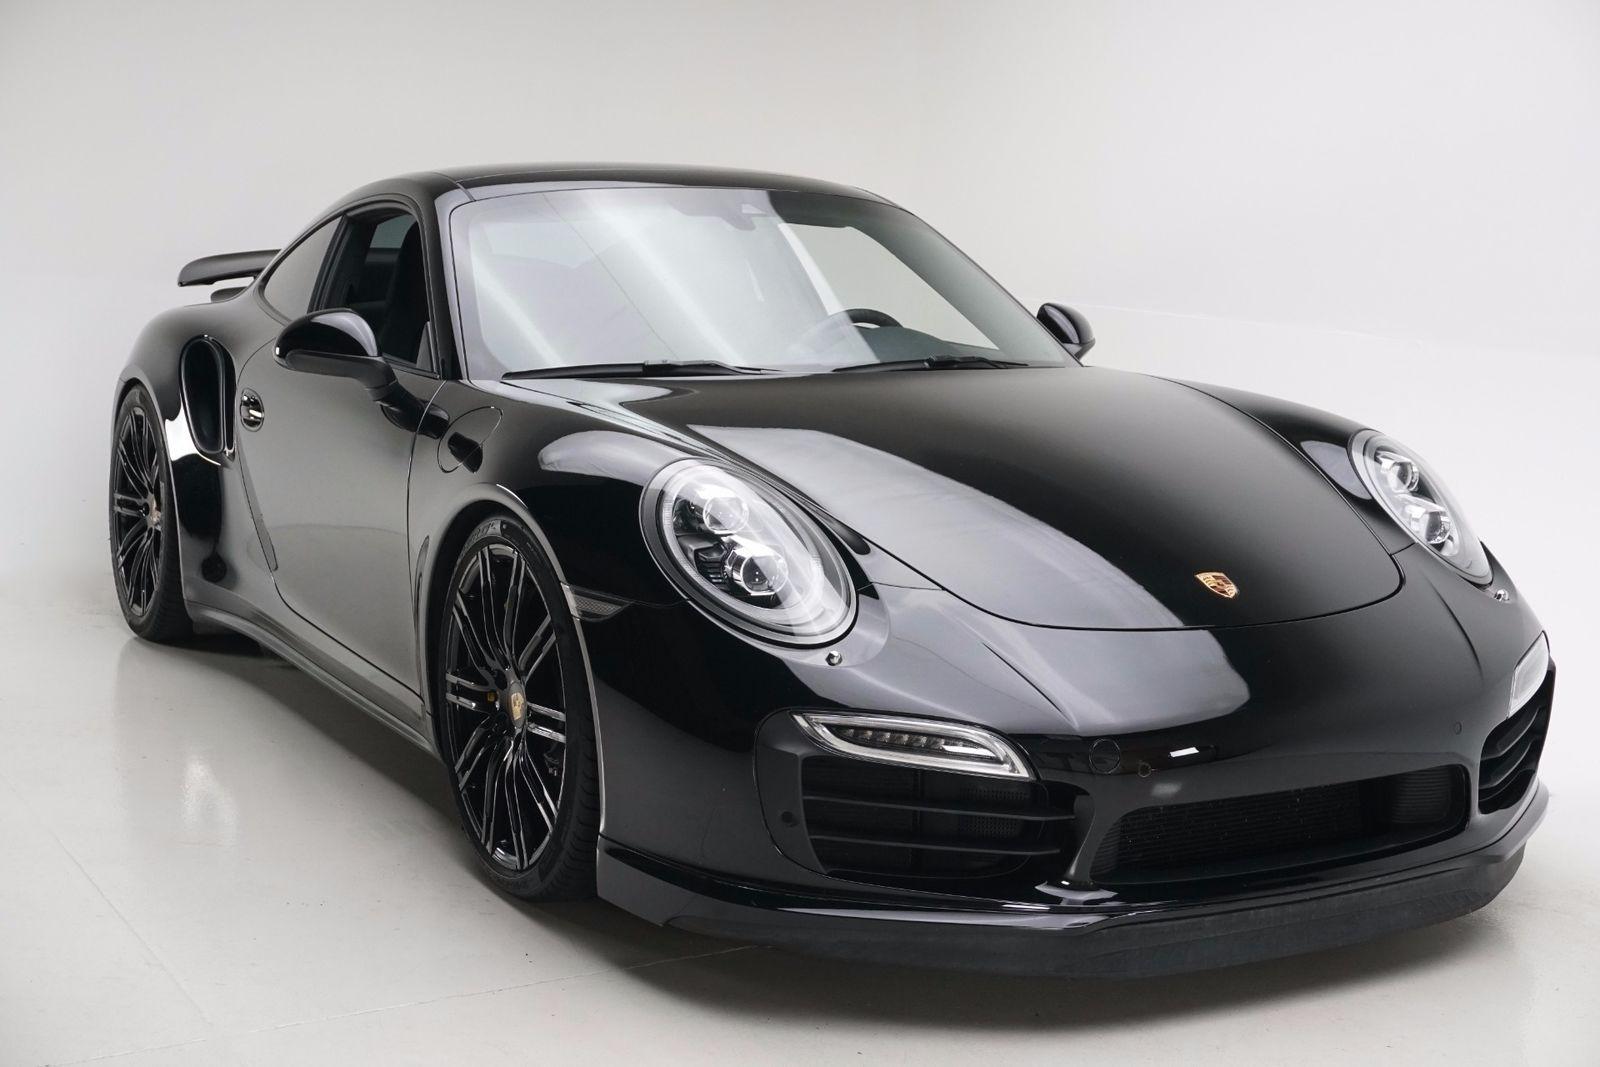 Amazing 2014 Porsche 911 Turbo S 2014 Porsche 911 Turbo S 2017 2018 24carshop